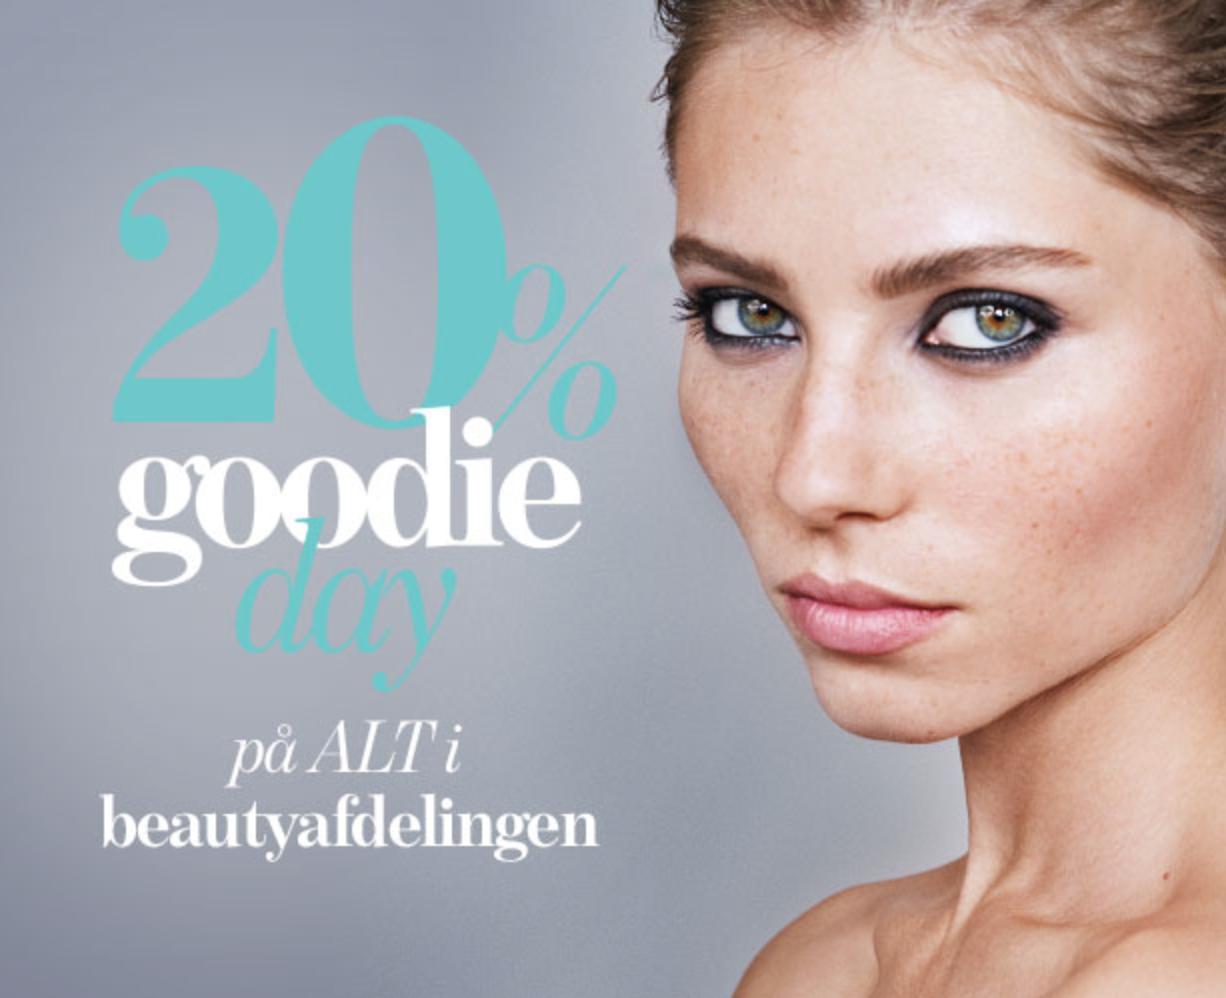 magasin, goodie card, goodie days, beauty, blog, blogger, tip, tirsdag, camilla nørgaard christensen, carola, bloggers delight, 20%, rabat